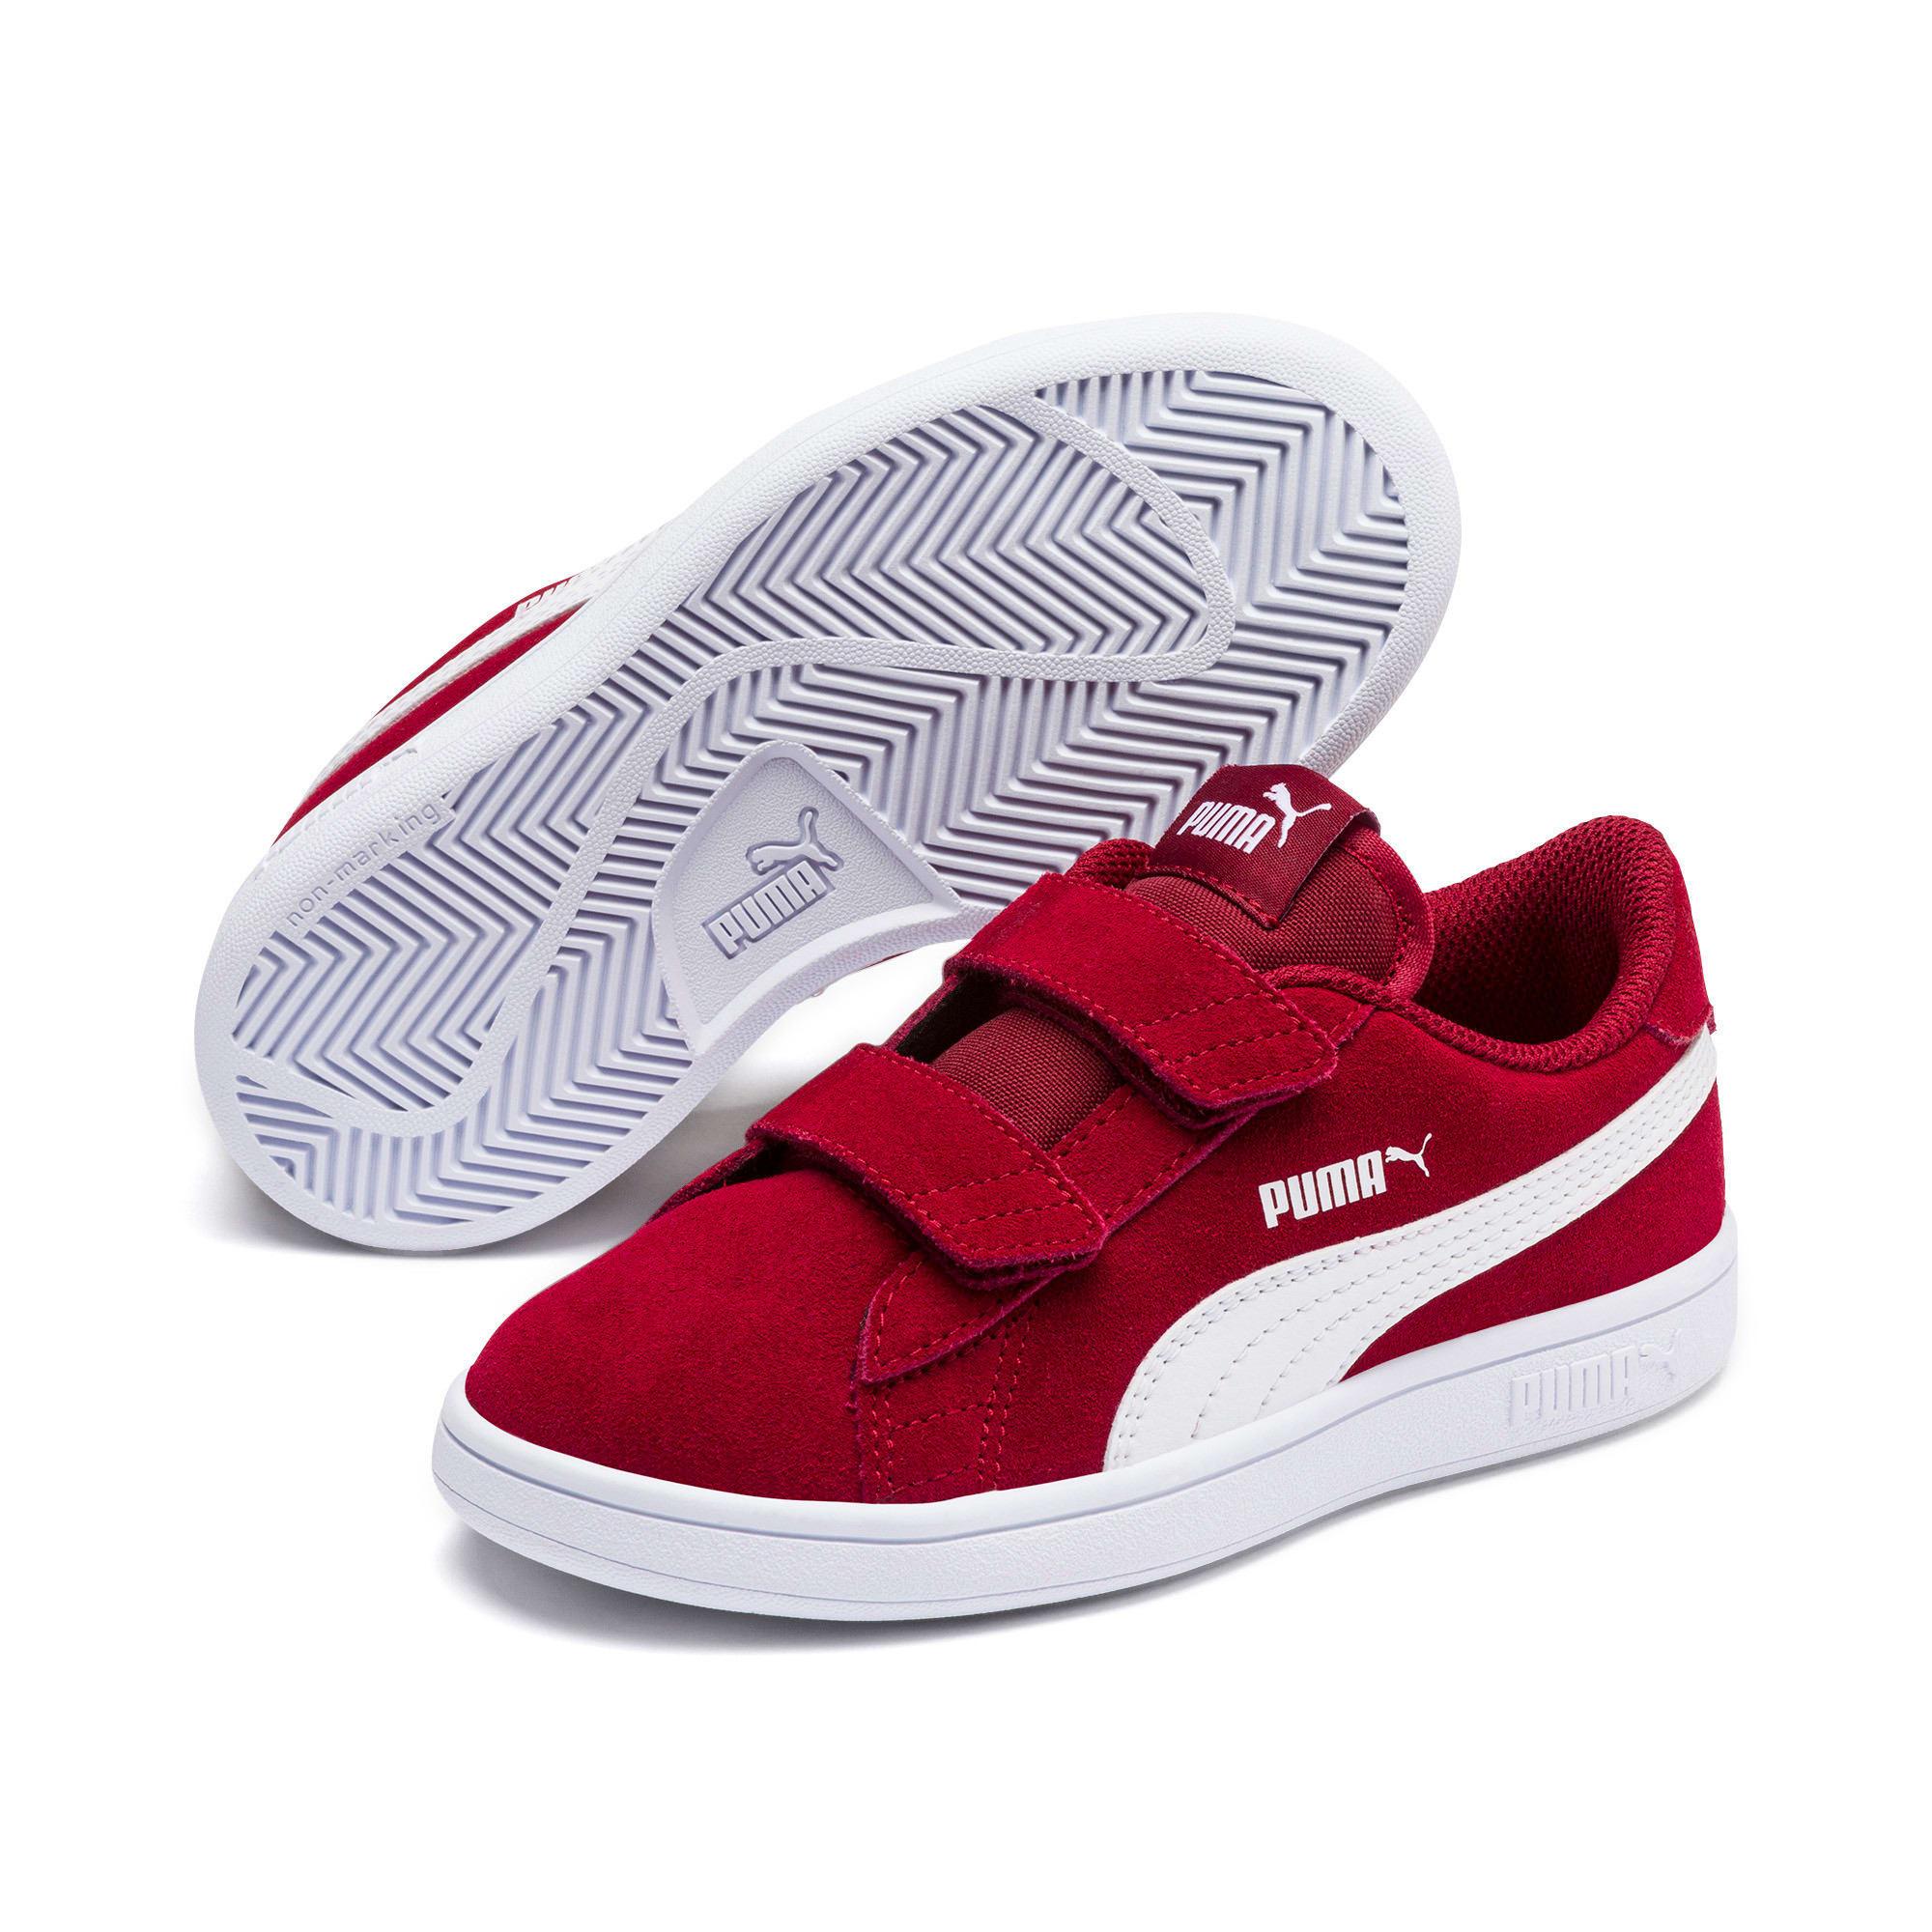 Thumbnail 2 of Smash v2 Suede Little Kids' Shoes, Rhubarb-Puma White, medium